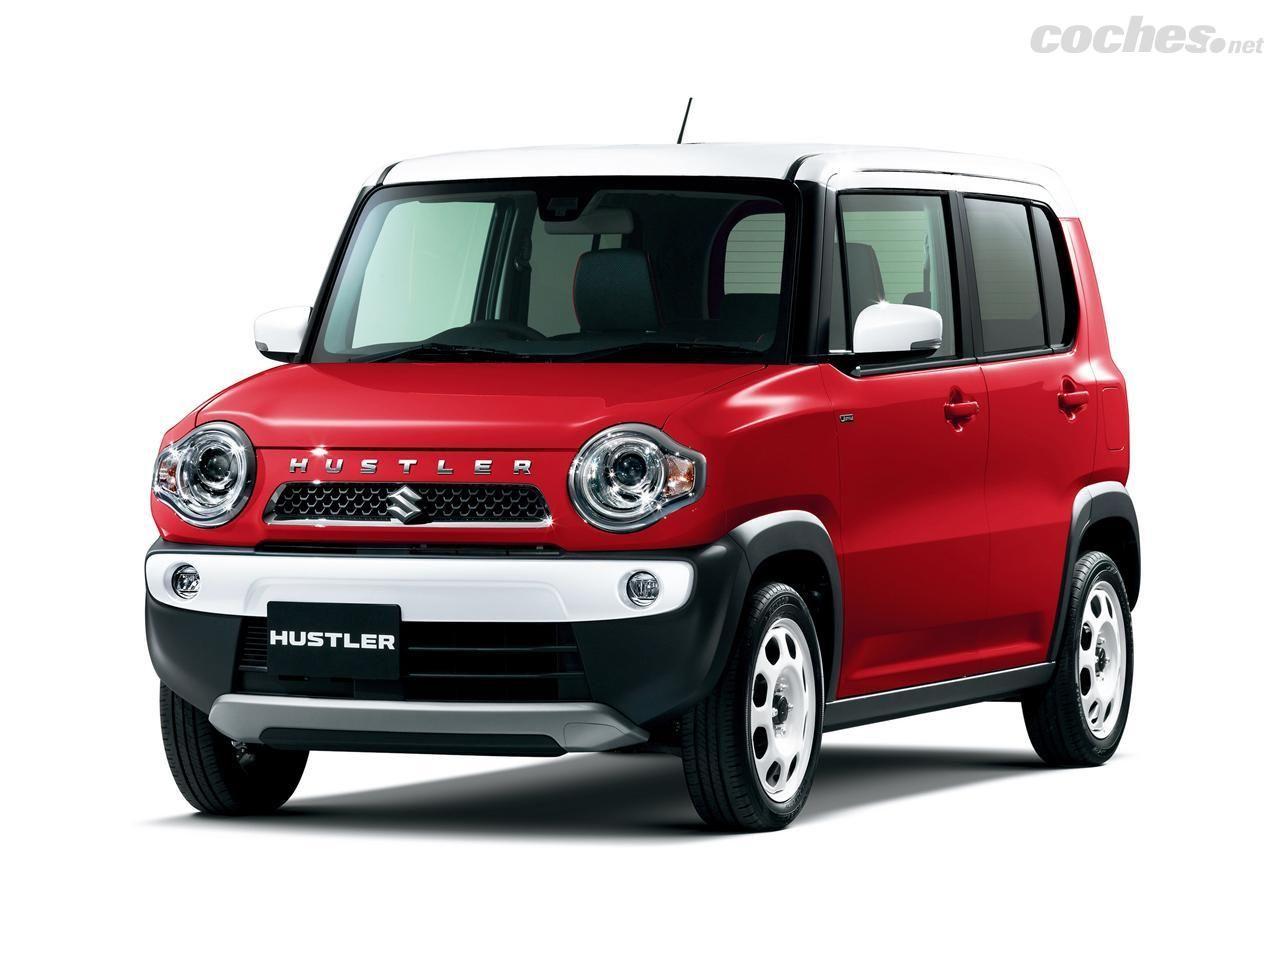 Fotos Suzuki Alto Rs Turbo